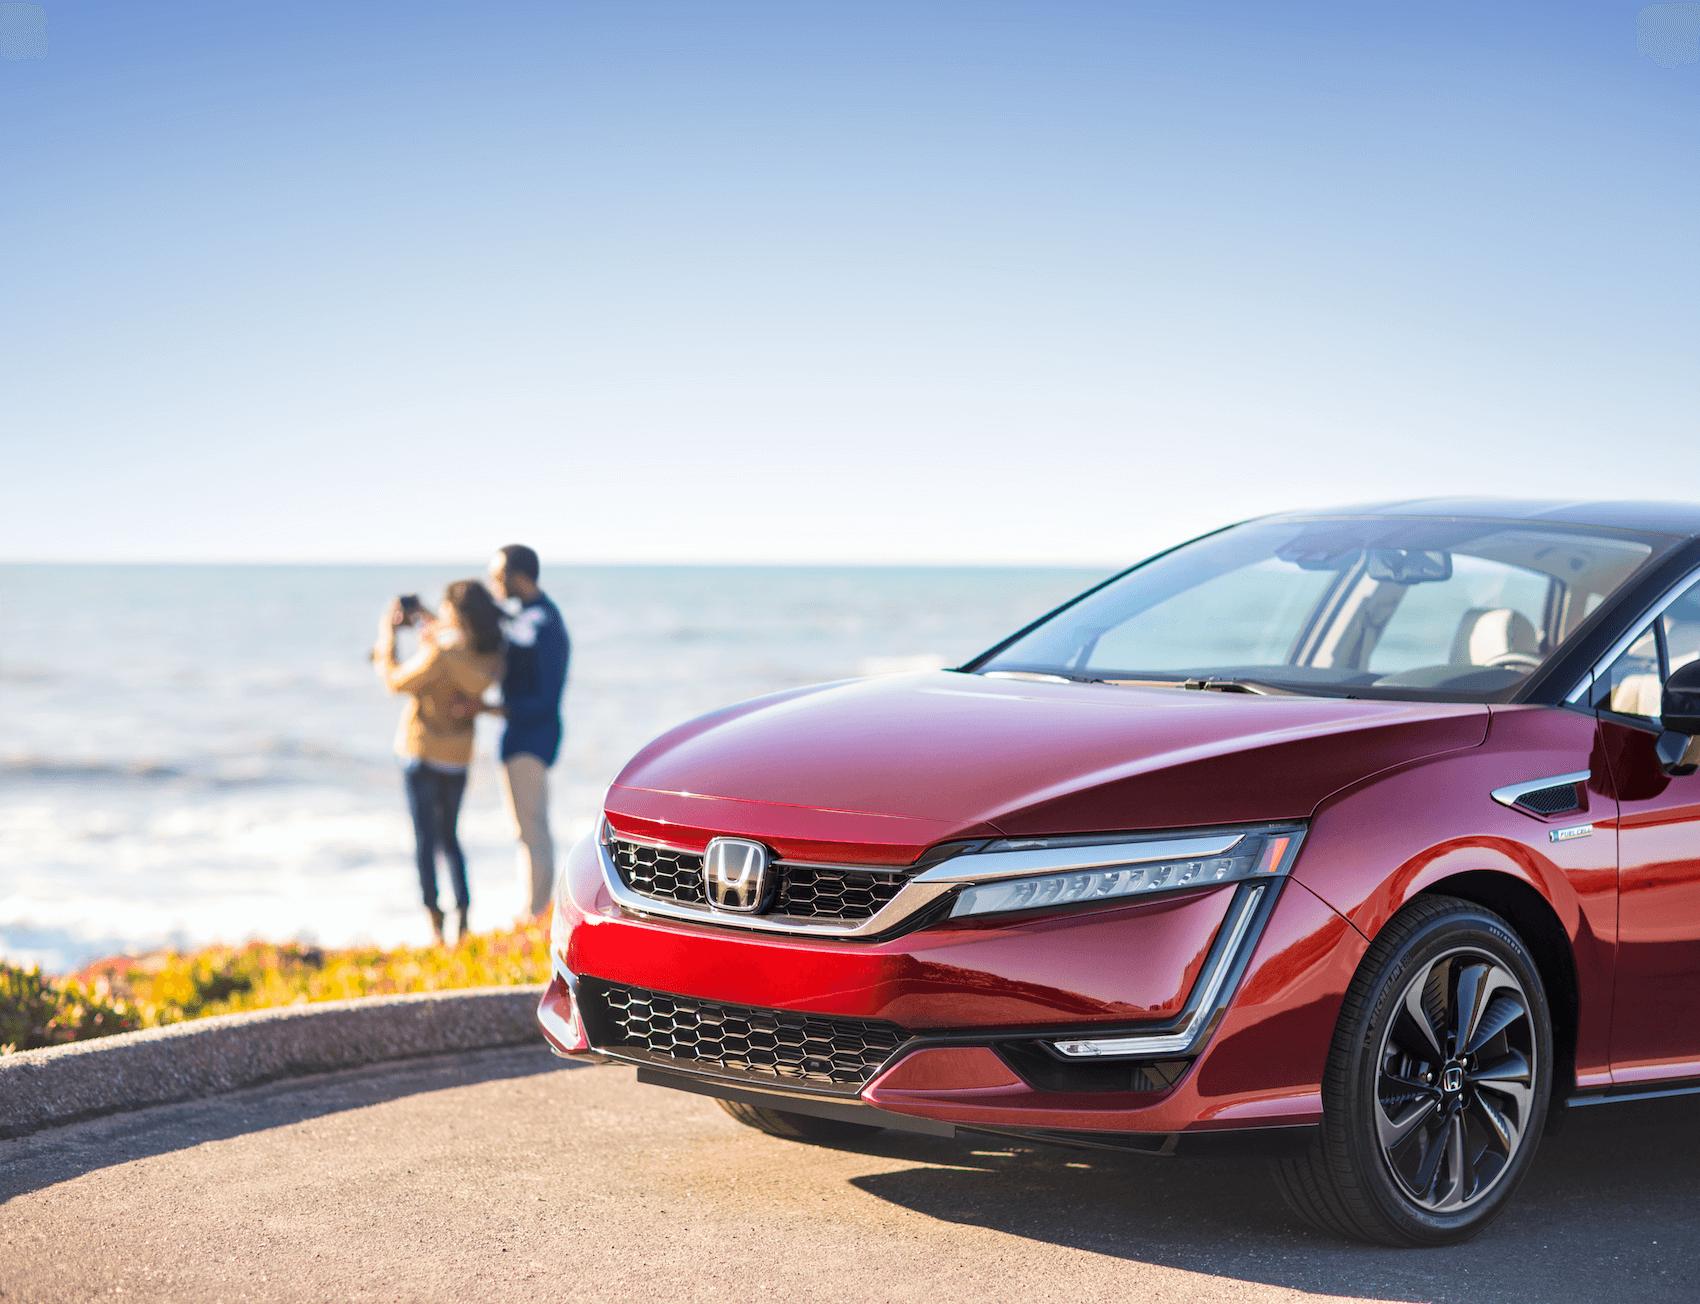 Red Honda Clarity